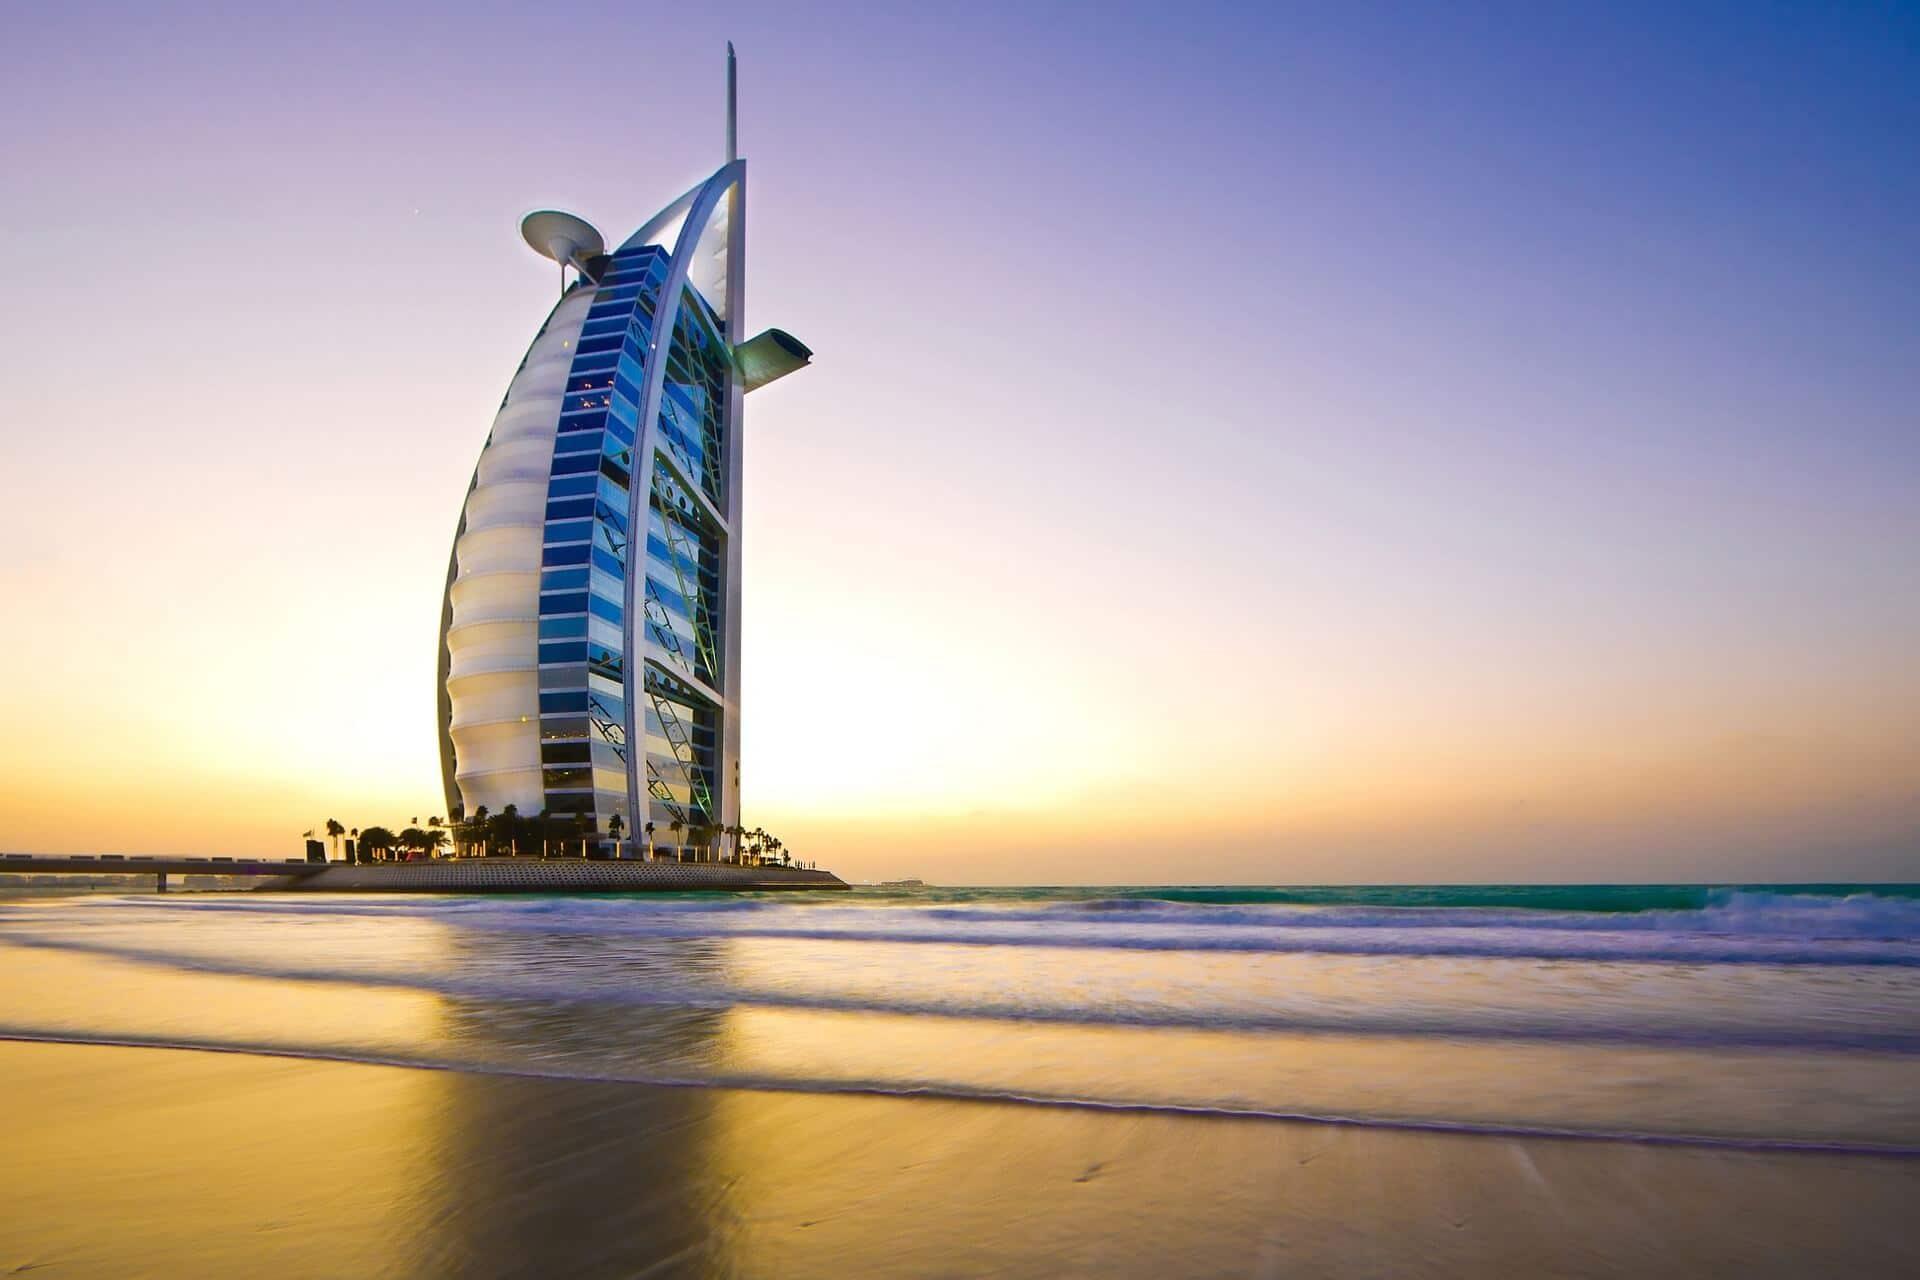 Burj Al Arab, Dubai's 7 star hotel